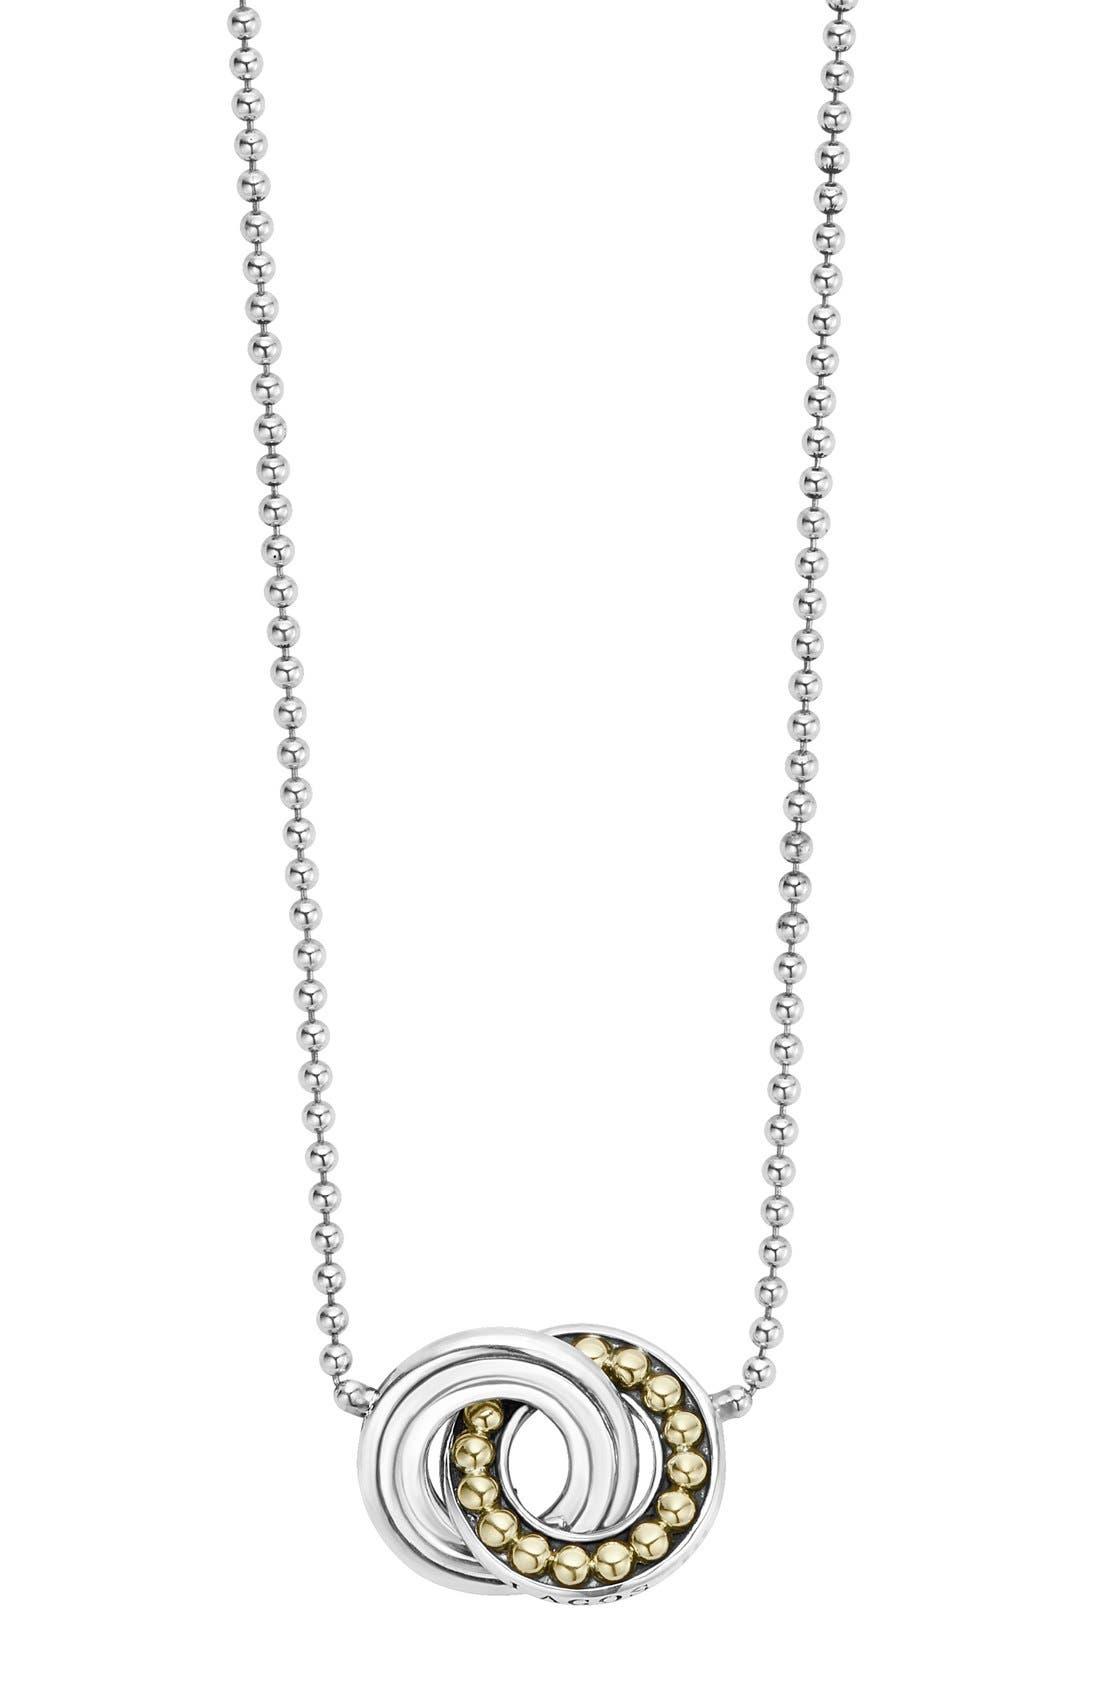 Enso Pendant Necklace,                         Main,                         color, SILVER/ PEARL